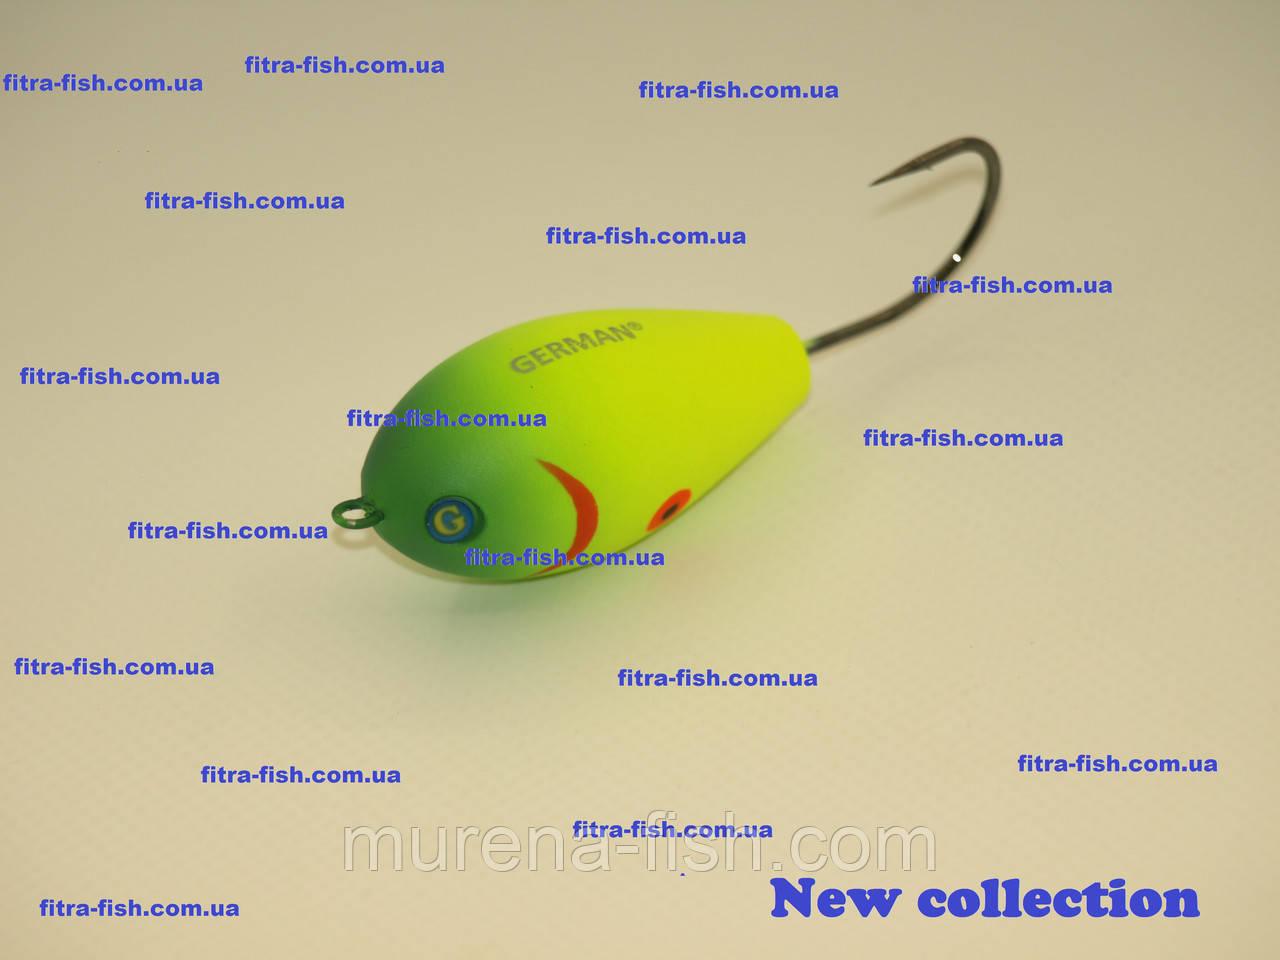 Воблер German Water Jumper- хорватское яйцо C112 50mm (action 0m+) 13g Bumble-lure Popper Поппер